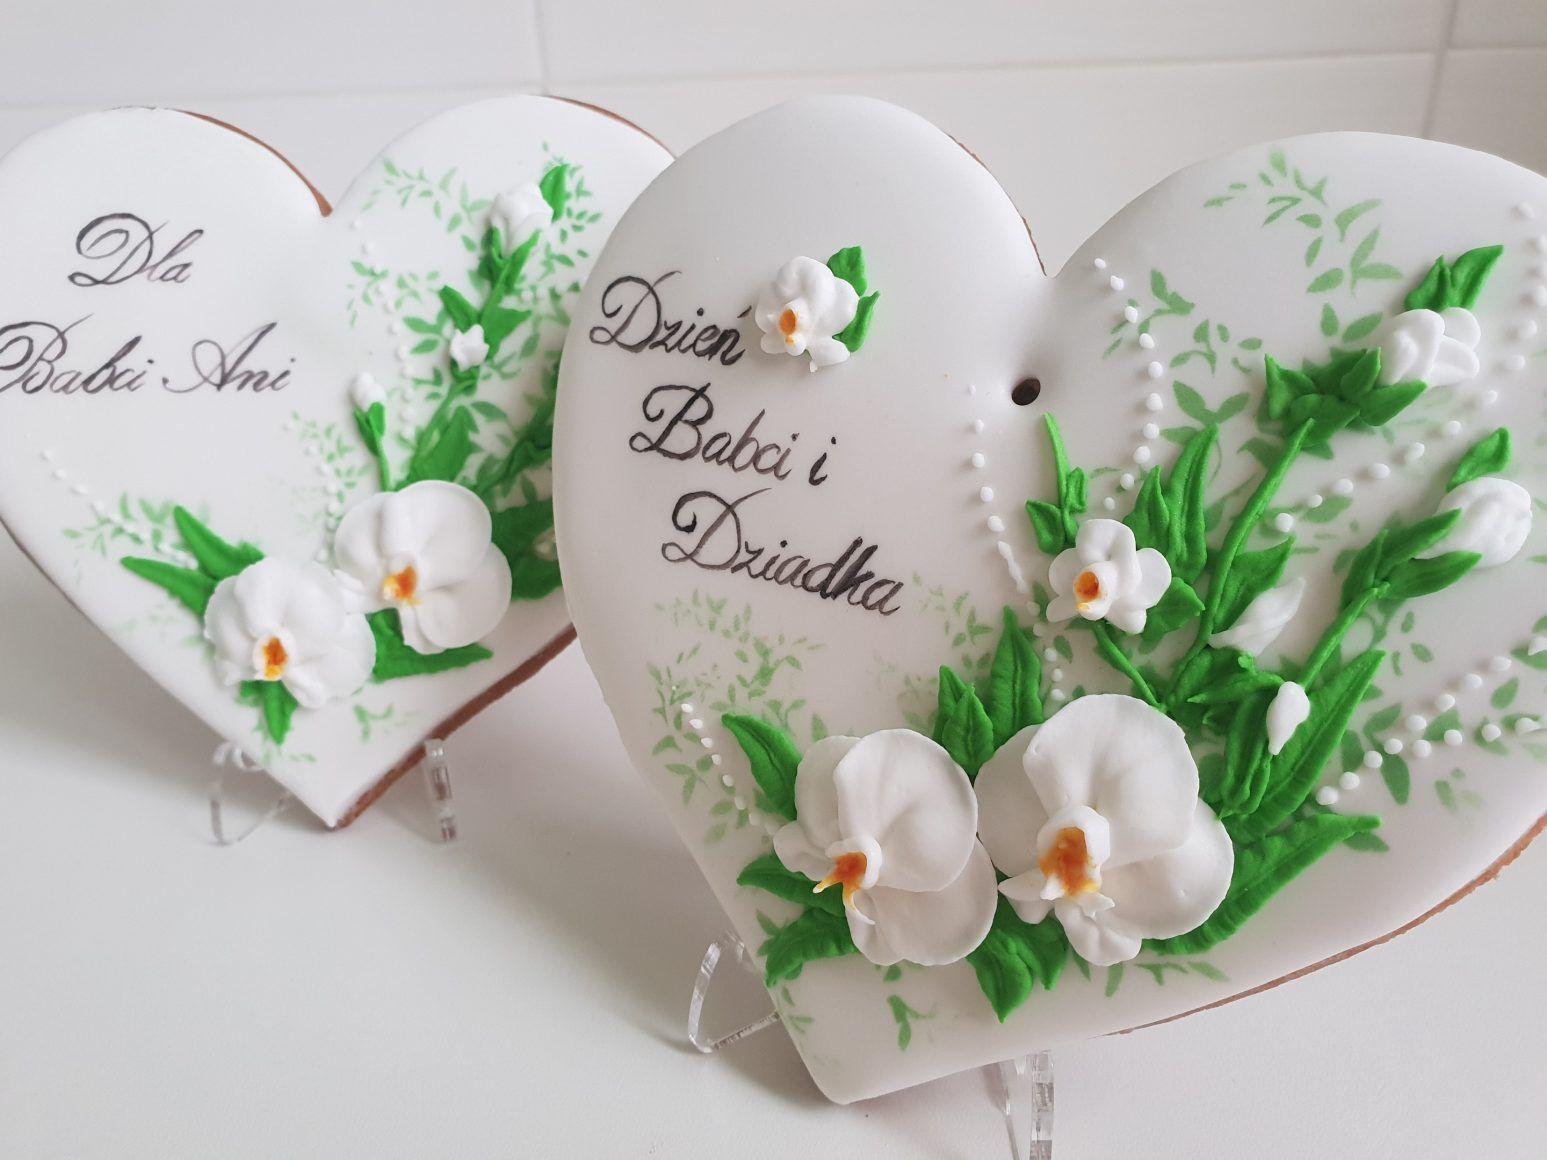 Pin By Basia Sweets Lukrowaneciaste On Dekorowane Ciastka Beautiful Cookies Cake Decorating Place Card Holders